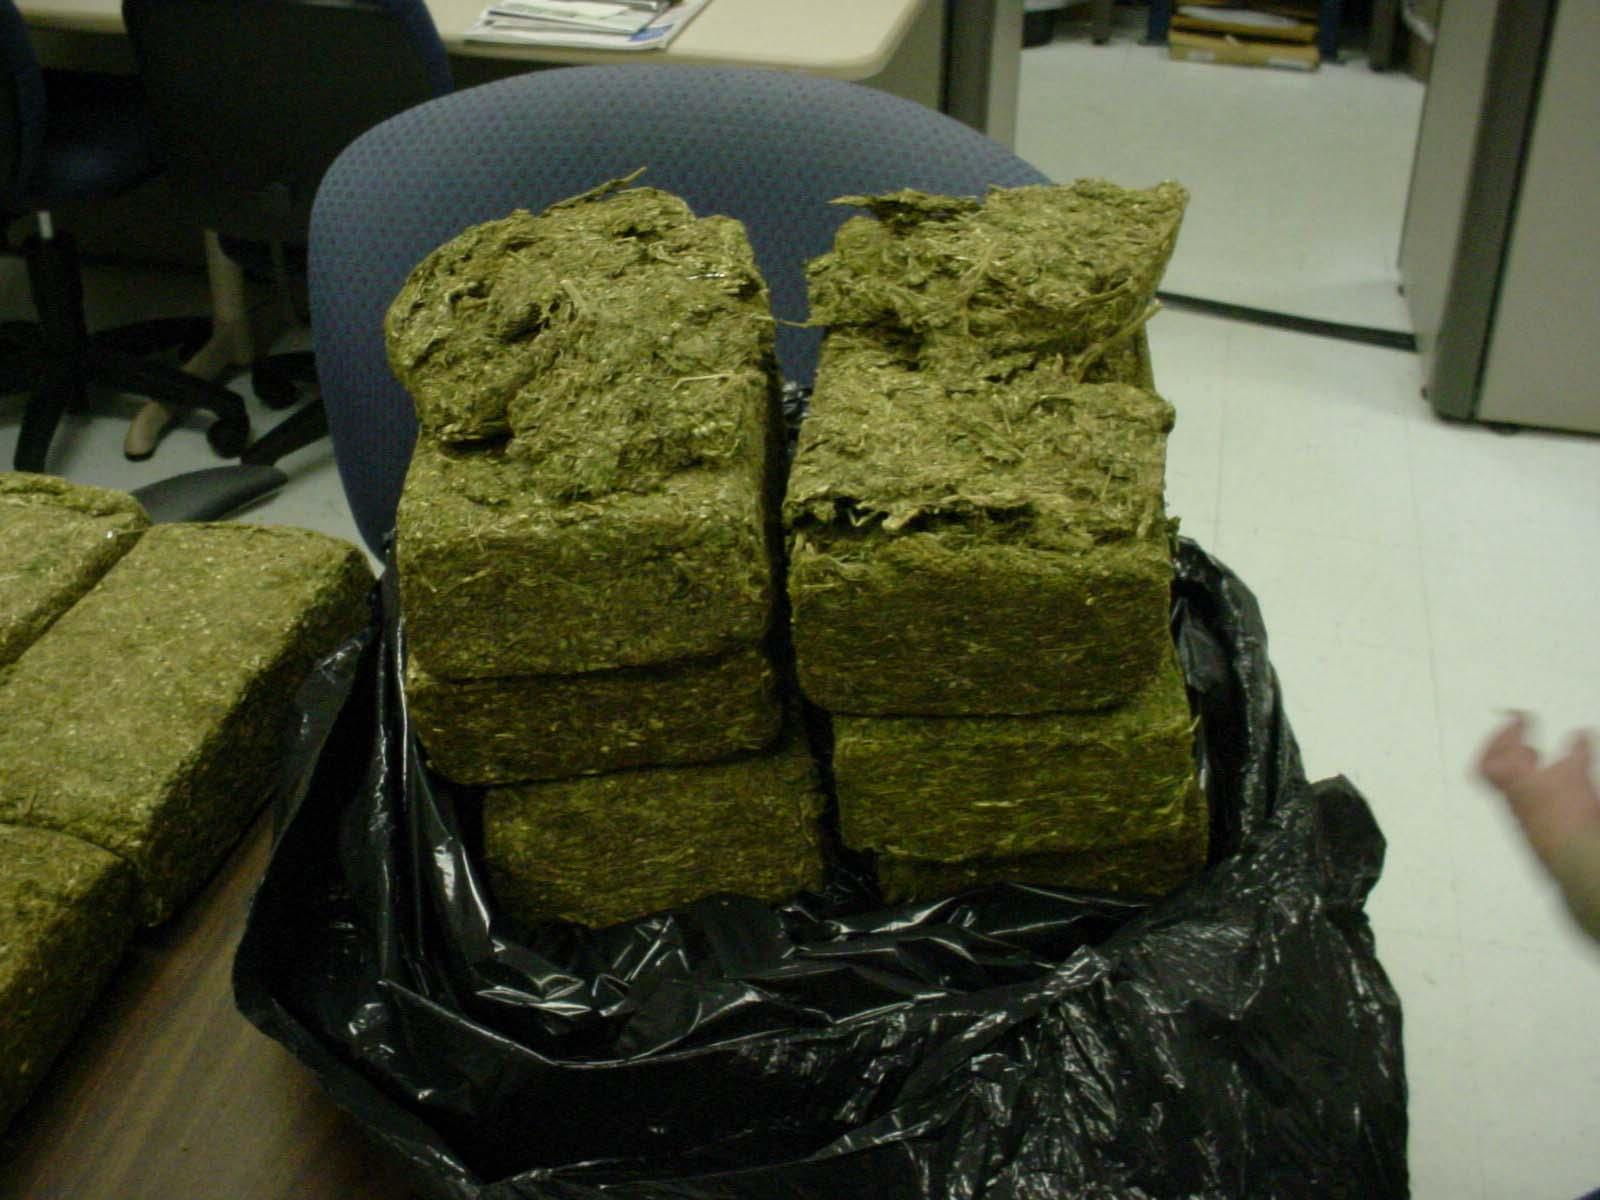 http://1.bp.blogspot.com/-PIj19vyzbVA/TpBLg9o9eBI/AAAAAAAAAVs/KYHl6-v9BOM/s1600/marijuana-bust.jpg